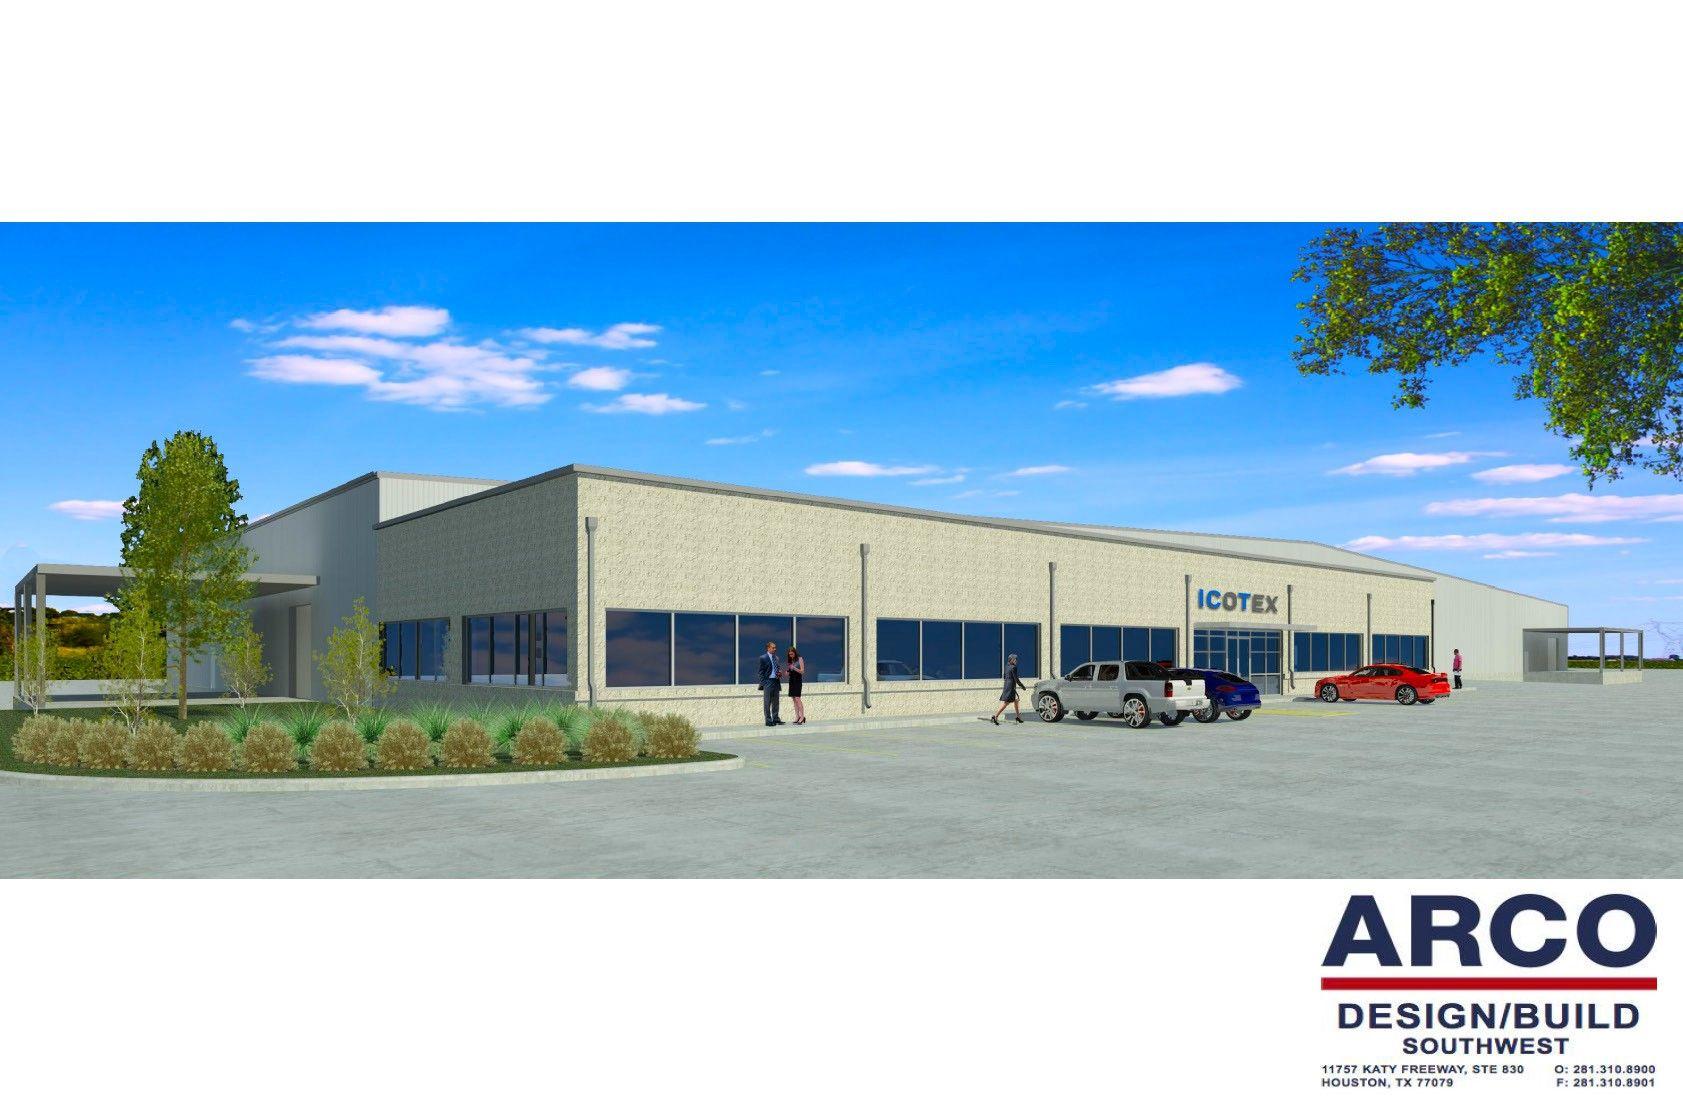 Mitsubishi Caterpillar to break ground on ICOTEX facility